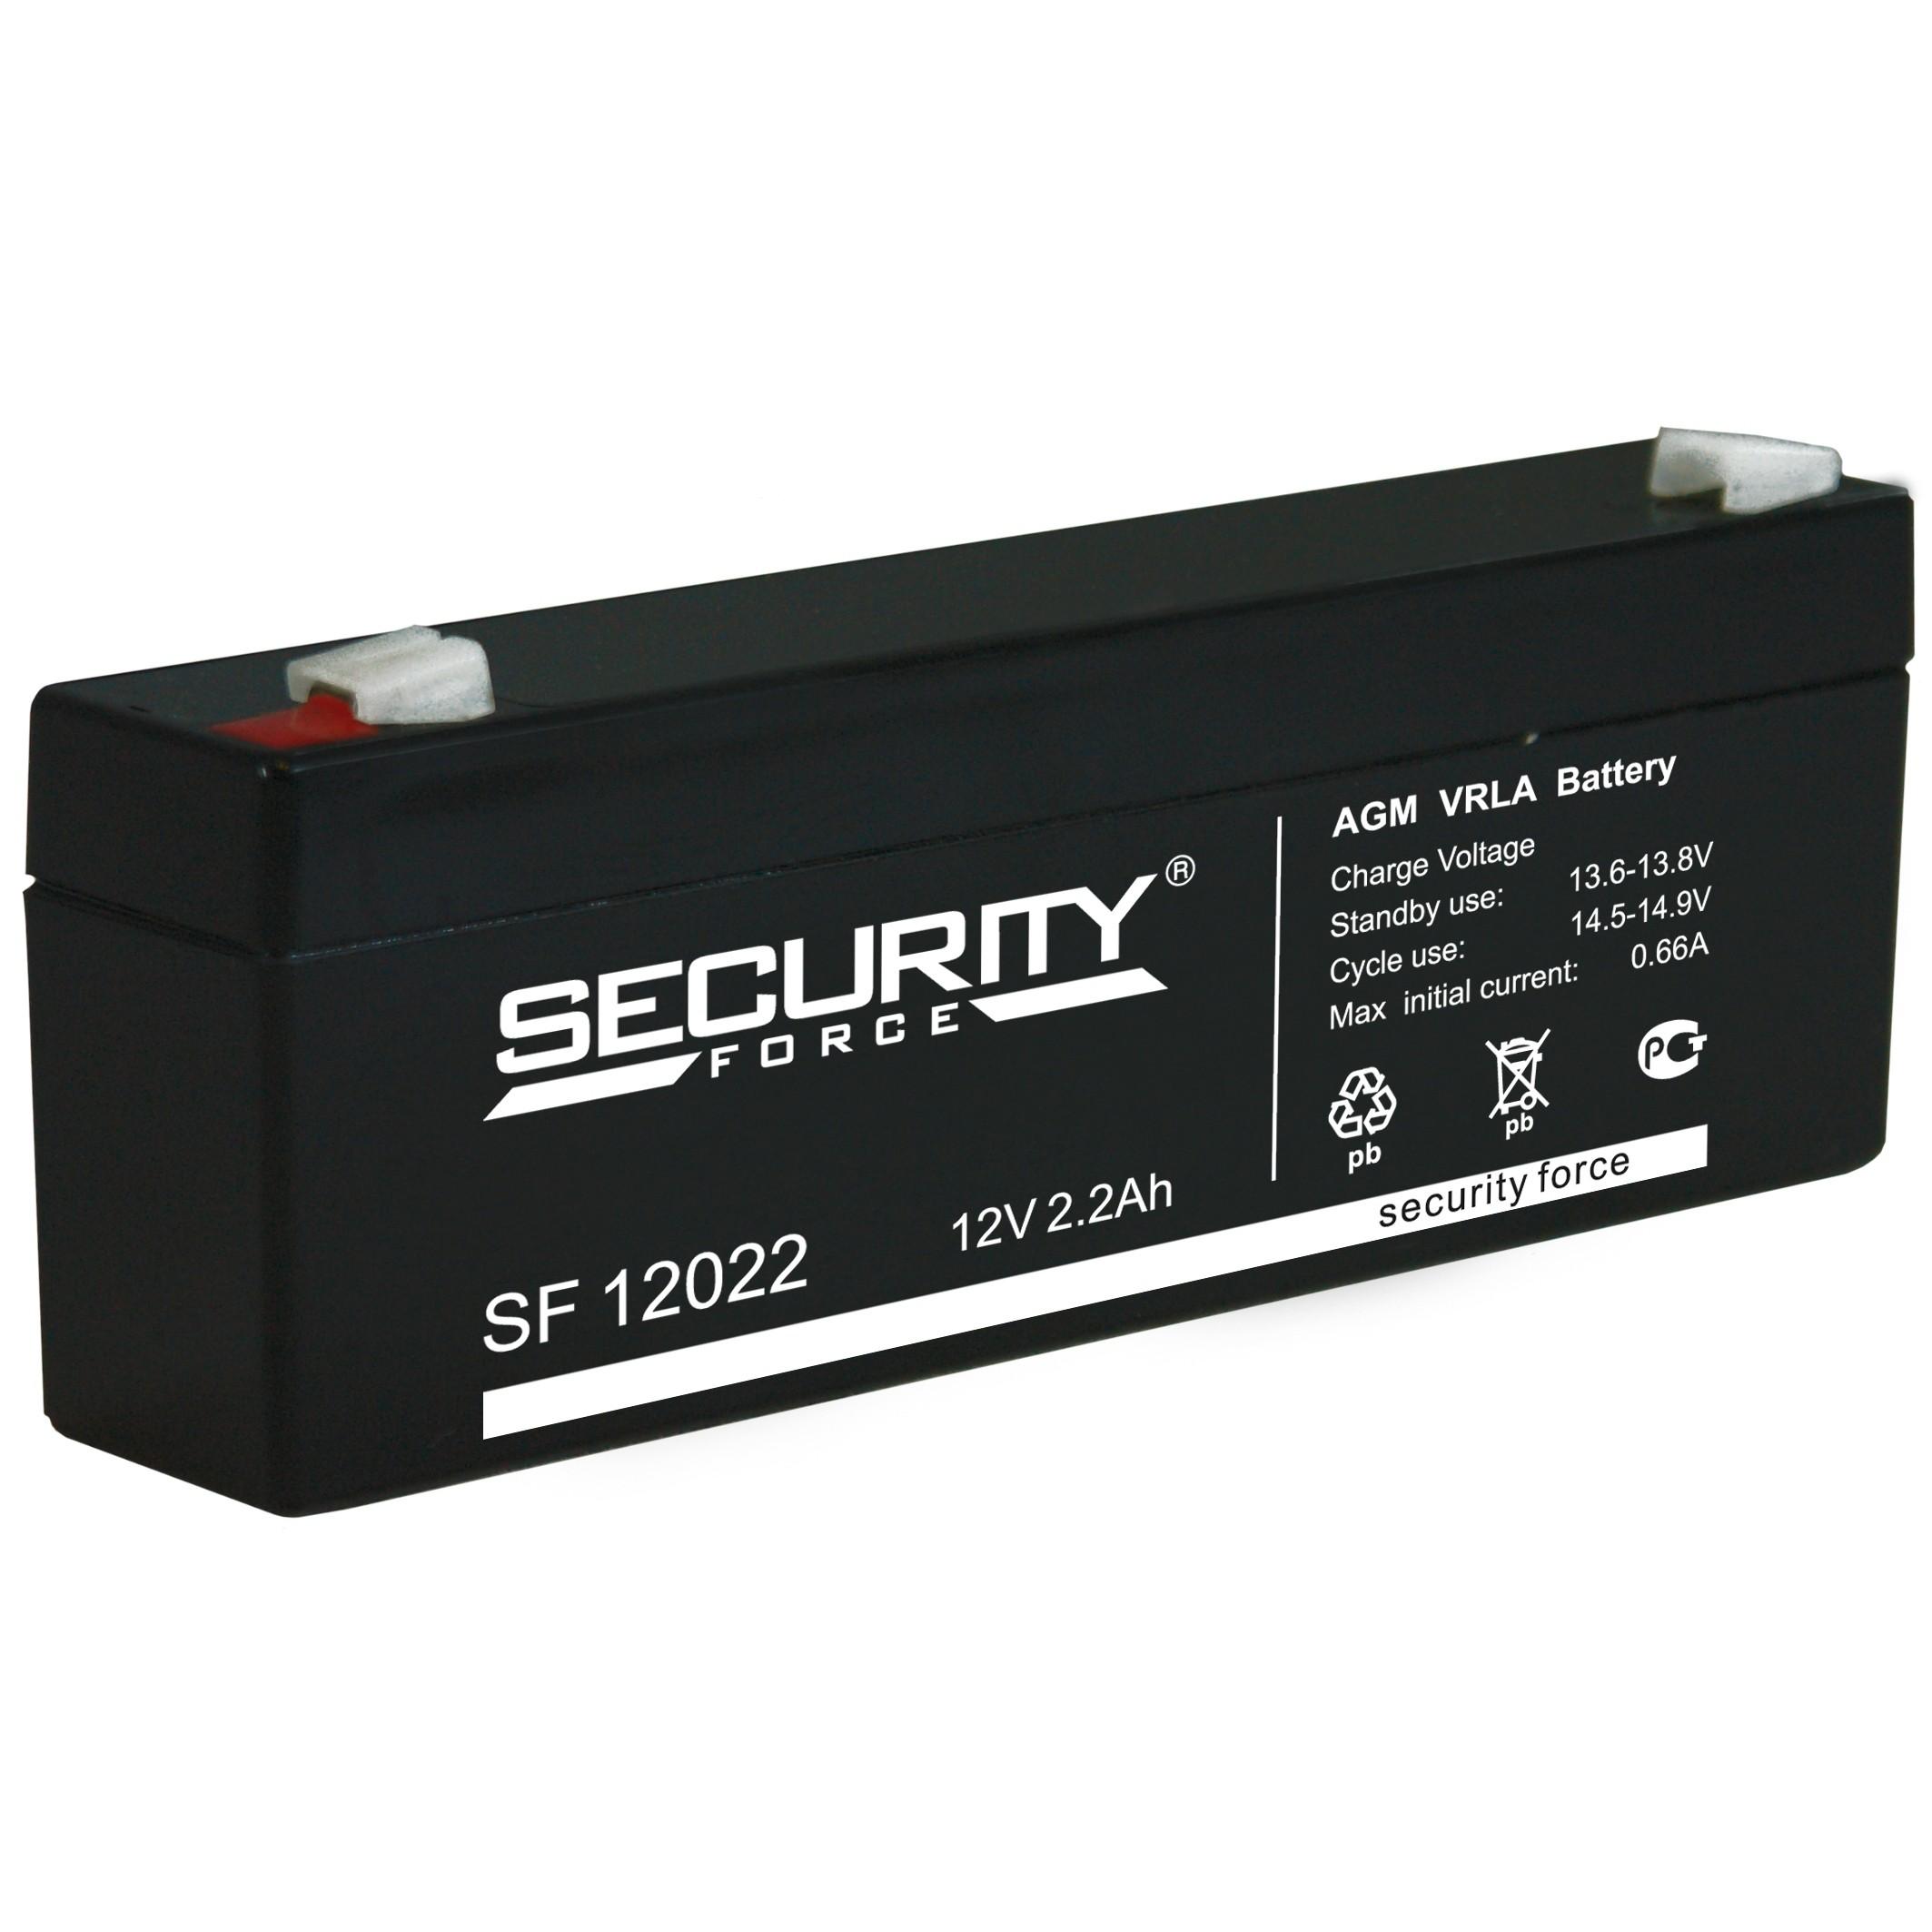 аккумулятор, Security, SF, 12V, 12В, 2,2Ач